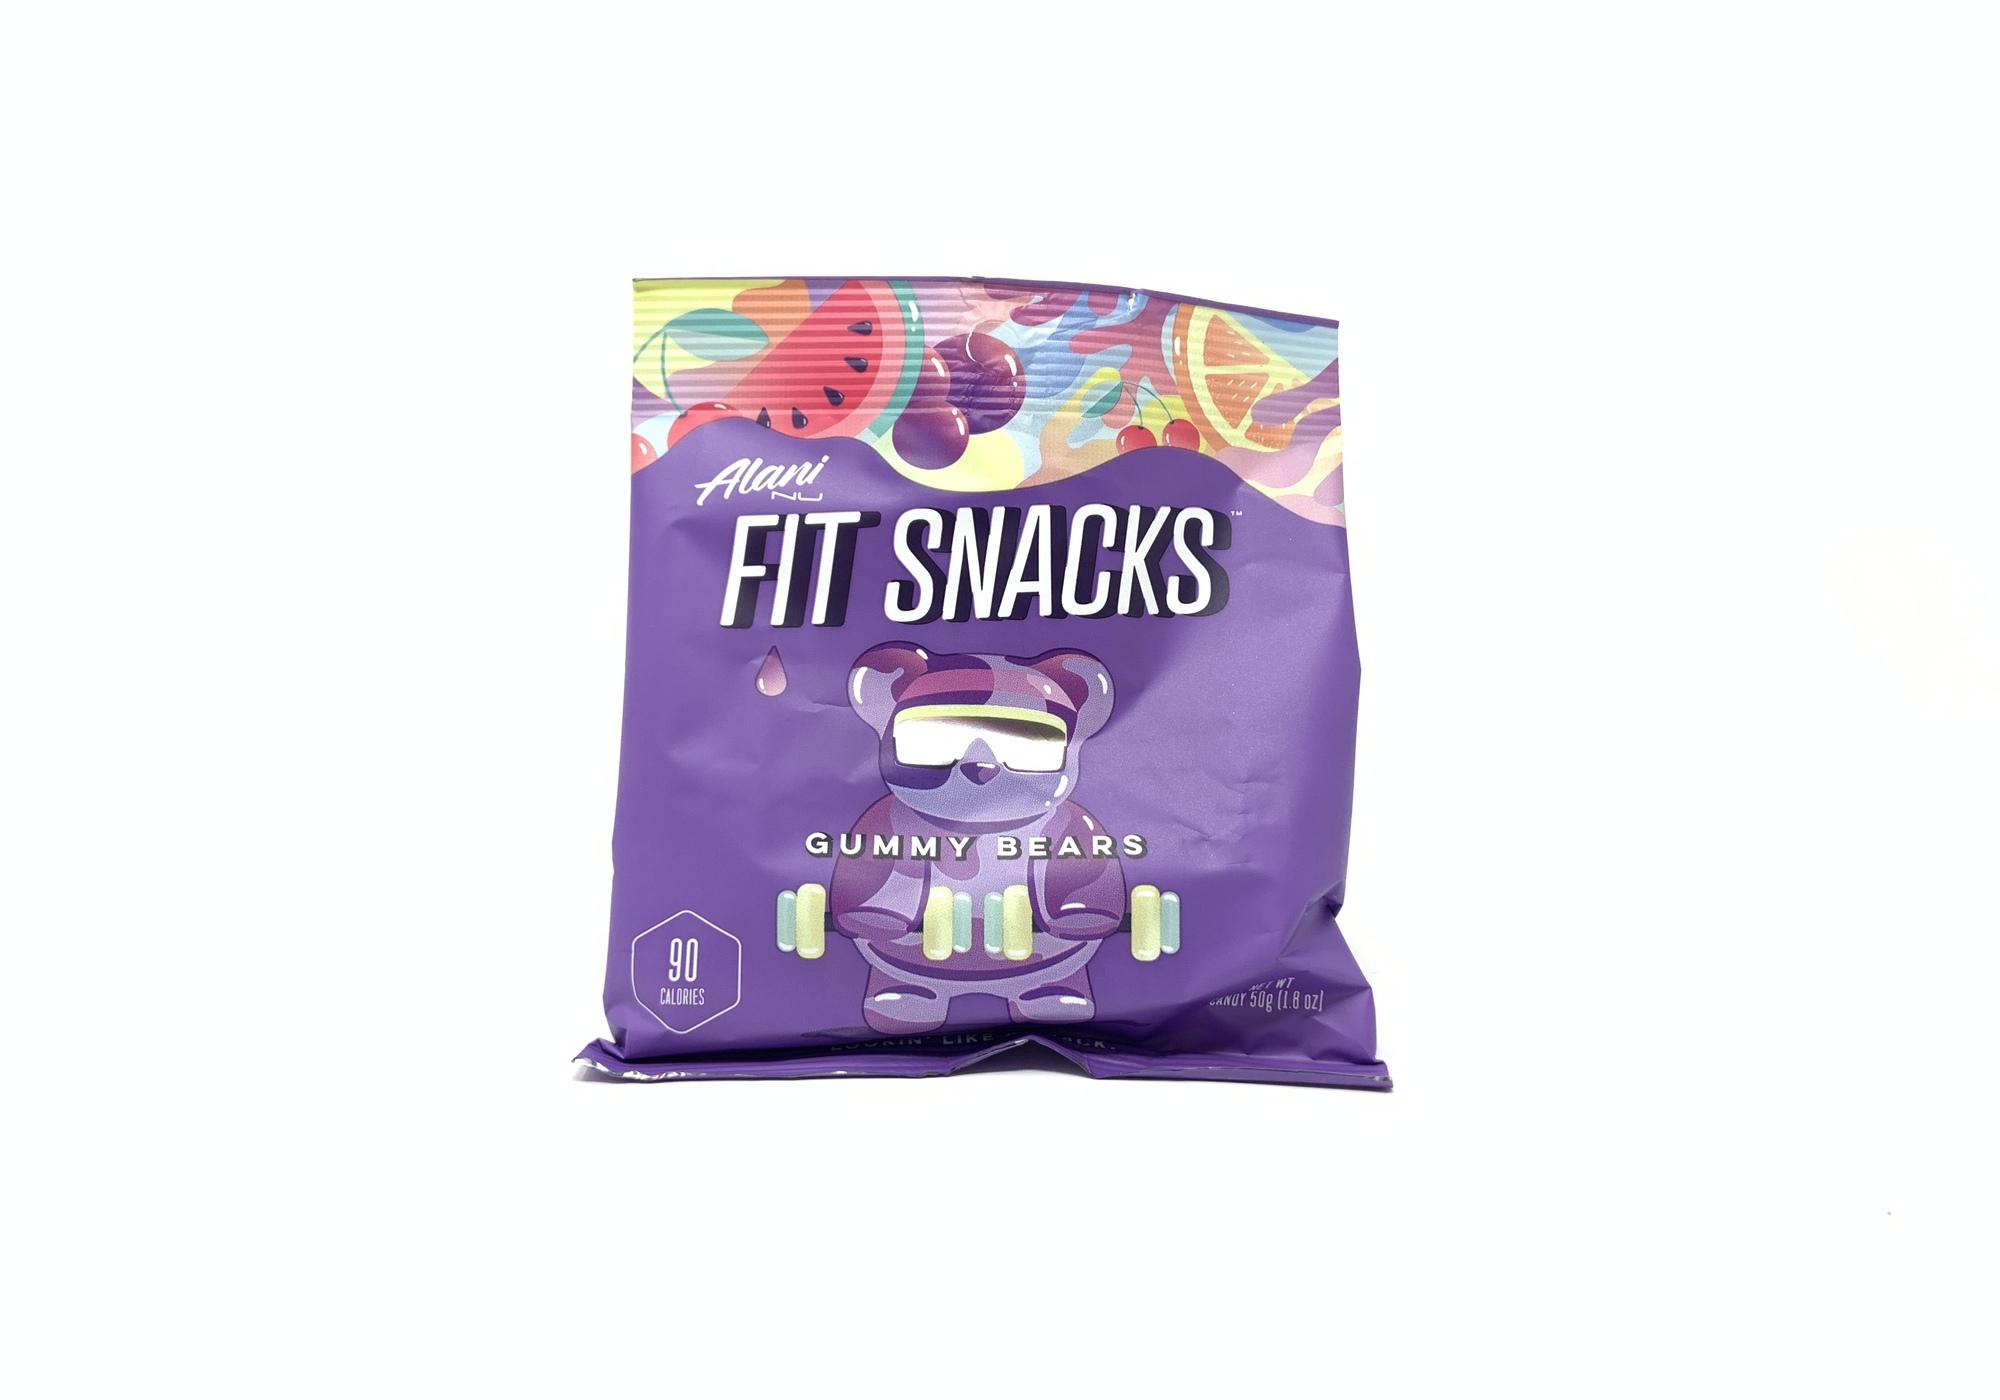 Fit Snacks Gummy Bears